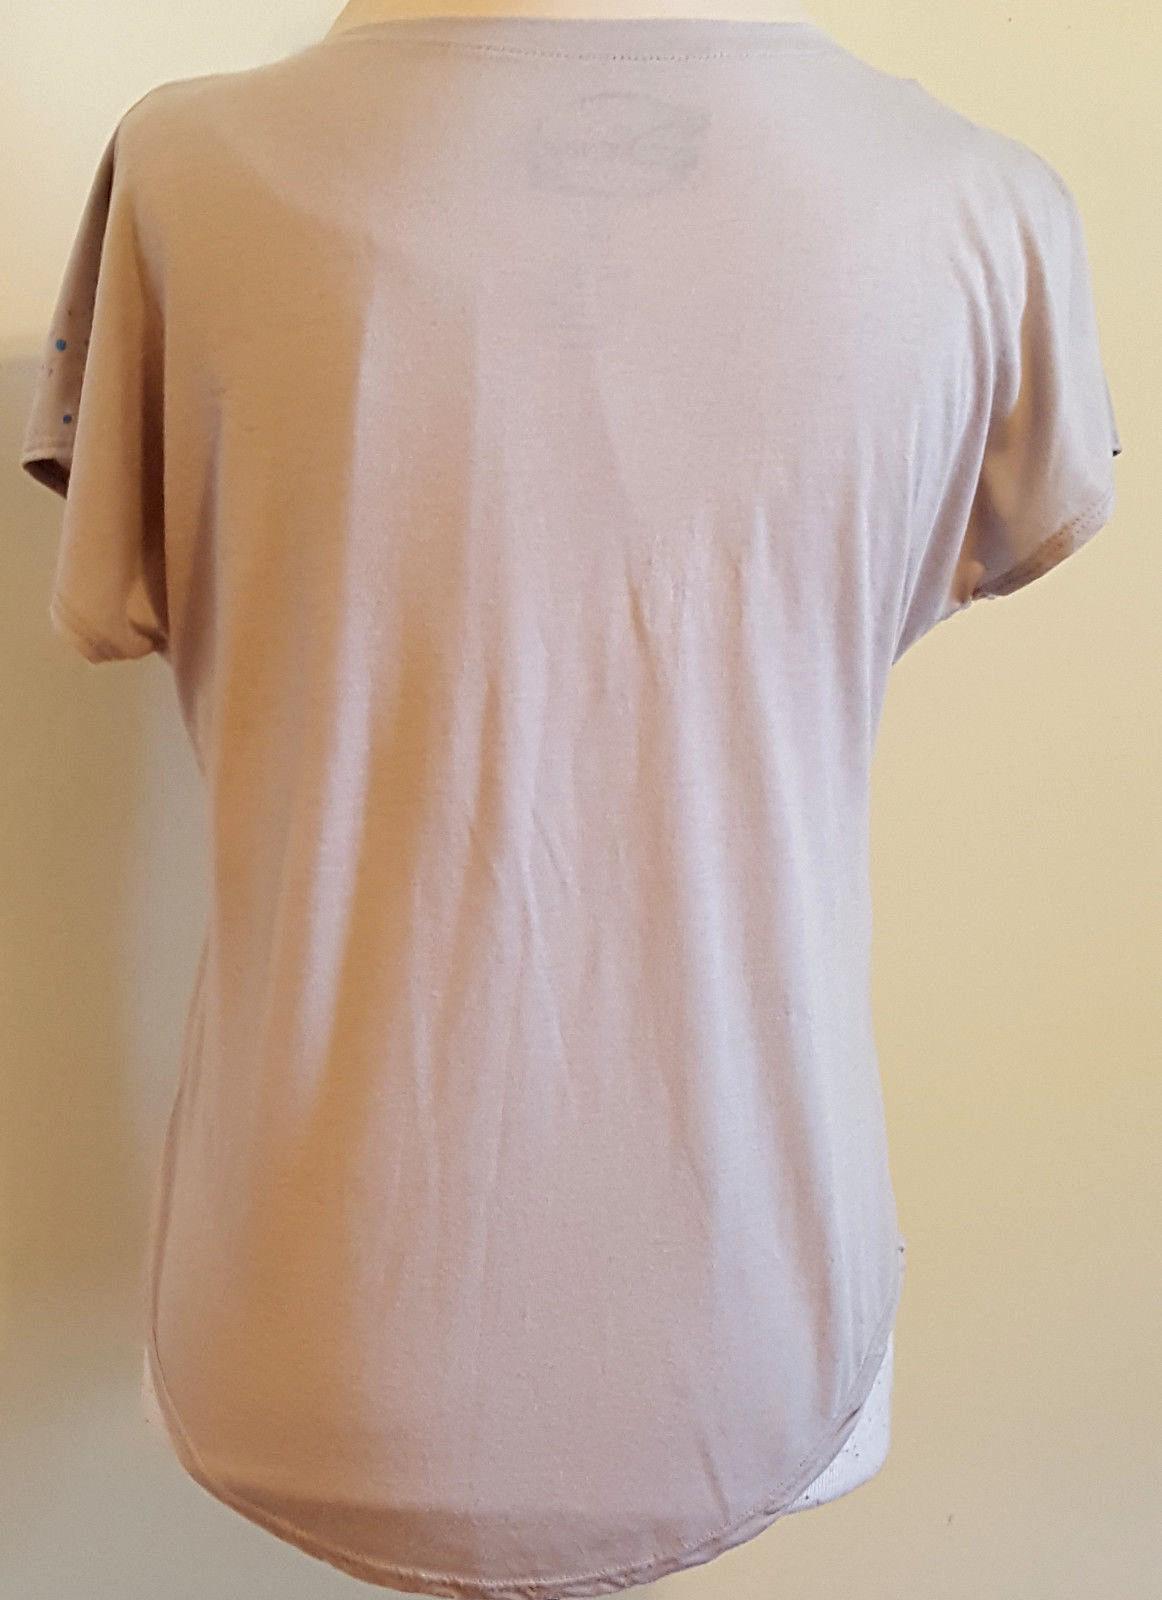 DISNEY RN 0100520 Women's Paint Splatter Mickey Mouse Loose Fit T-Shirt Size: M